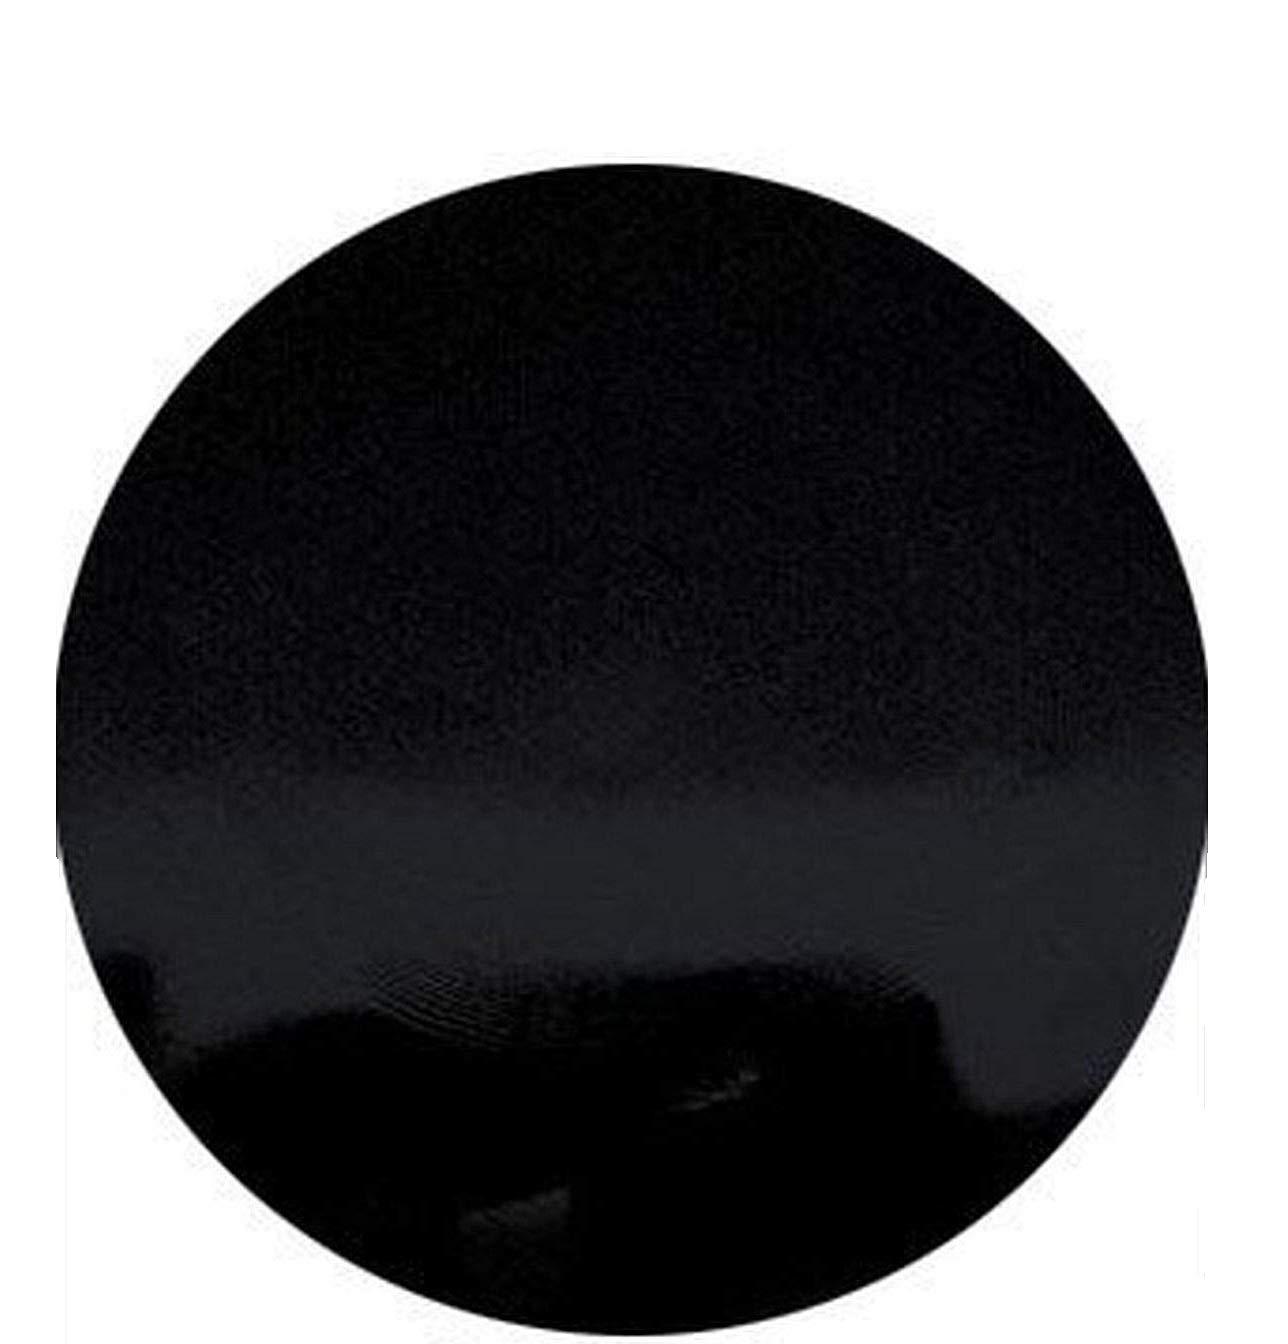 Infrarot- IR Filter infrarotfilter fü r ir fotografie 850nm infrarotfotografie Uzman-Versand